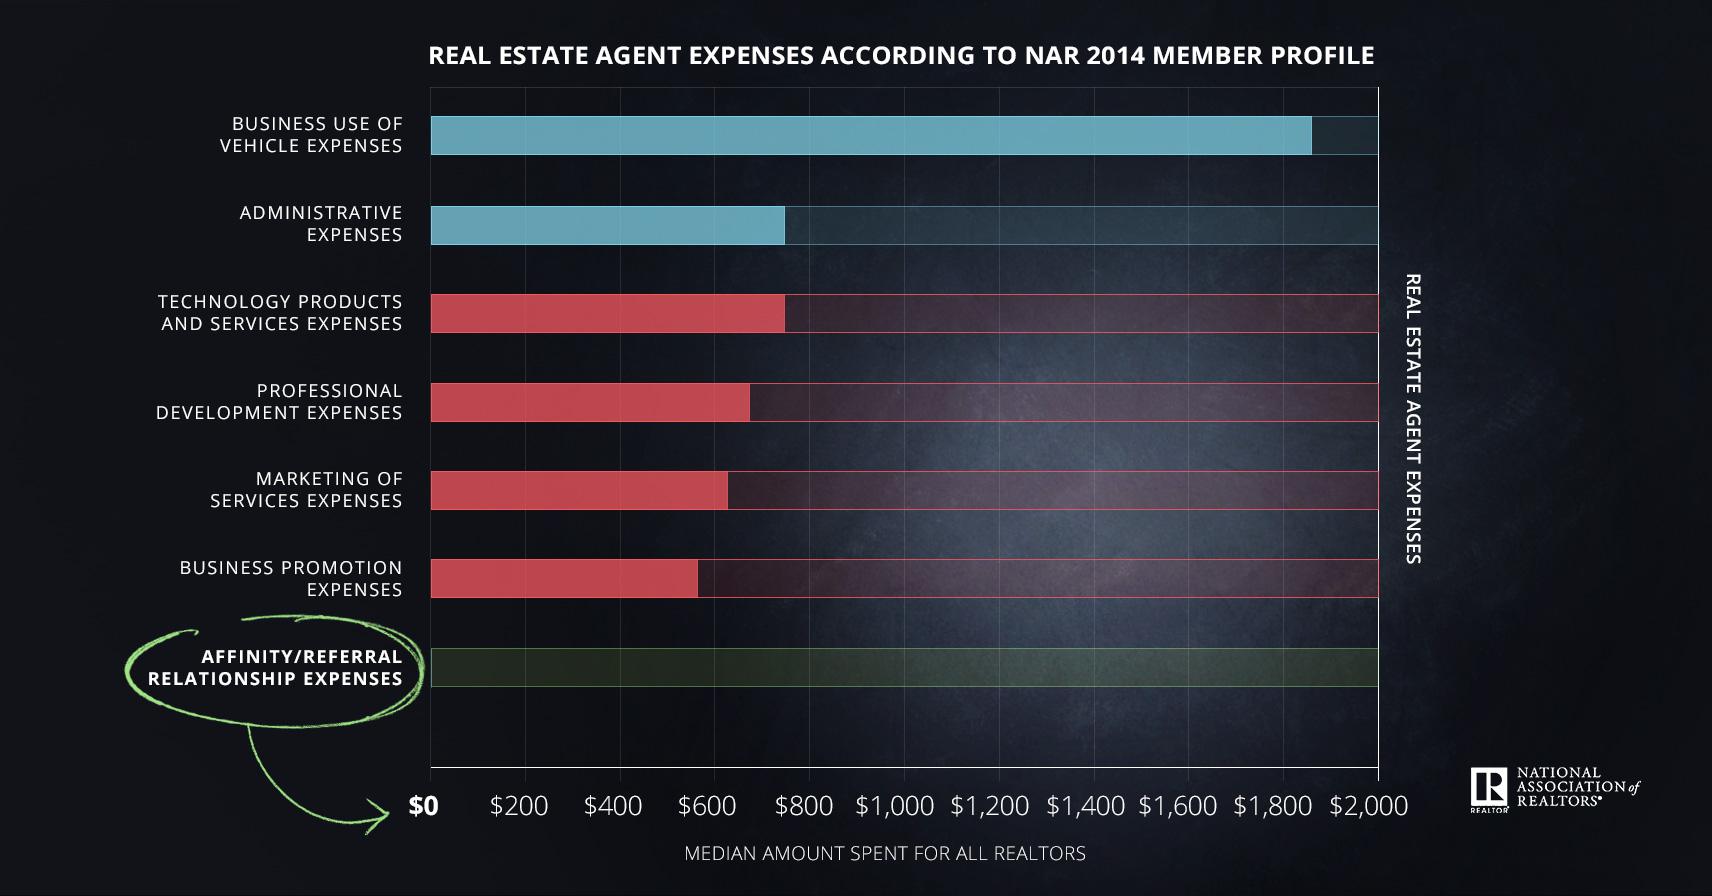 Realtor expenses - from ReminderMedia presentation